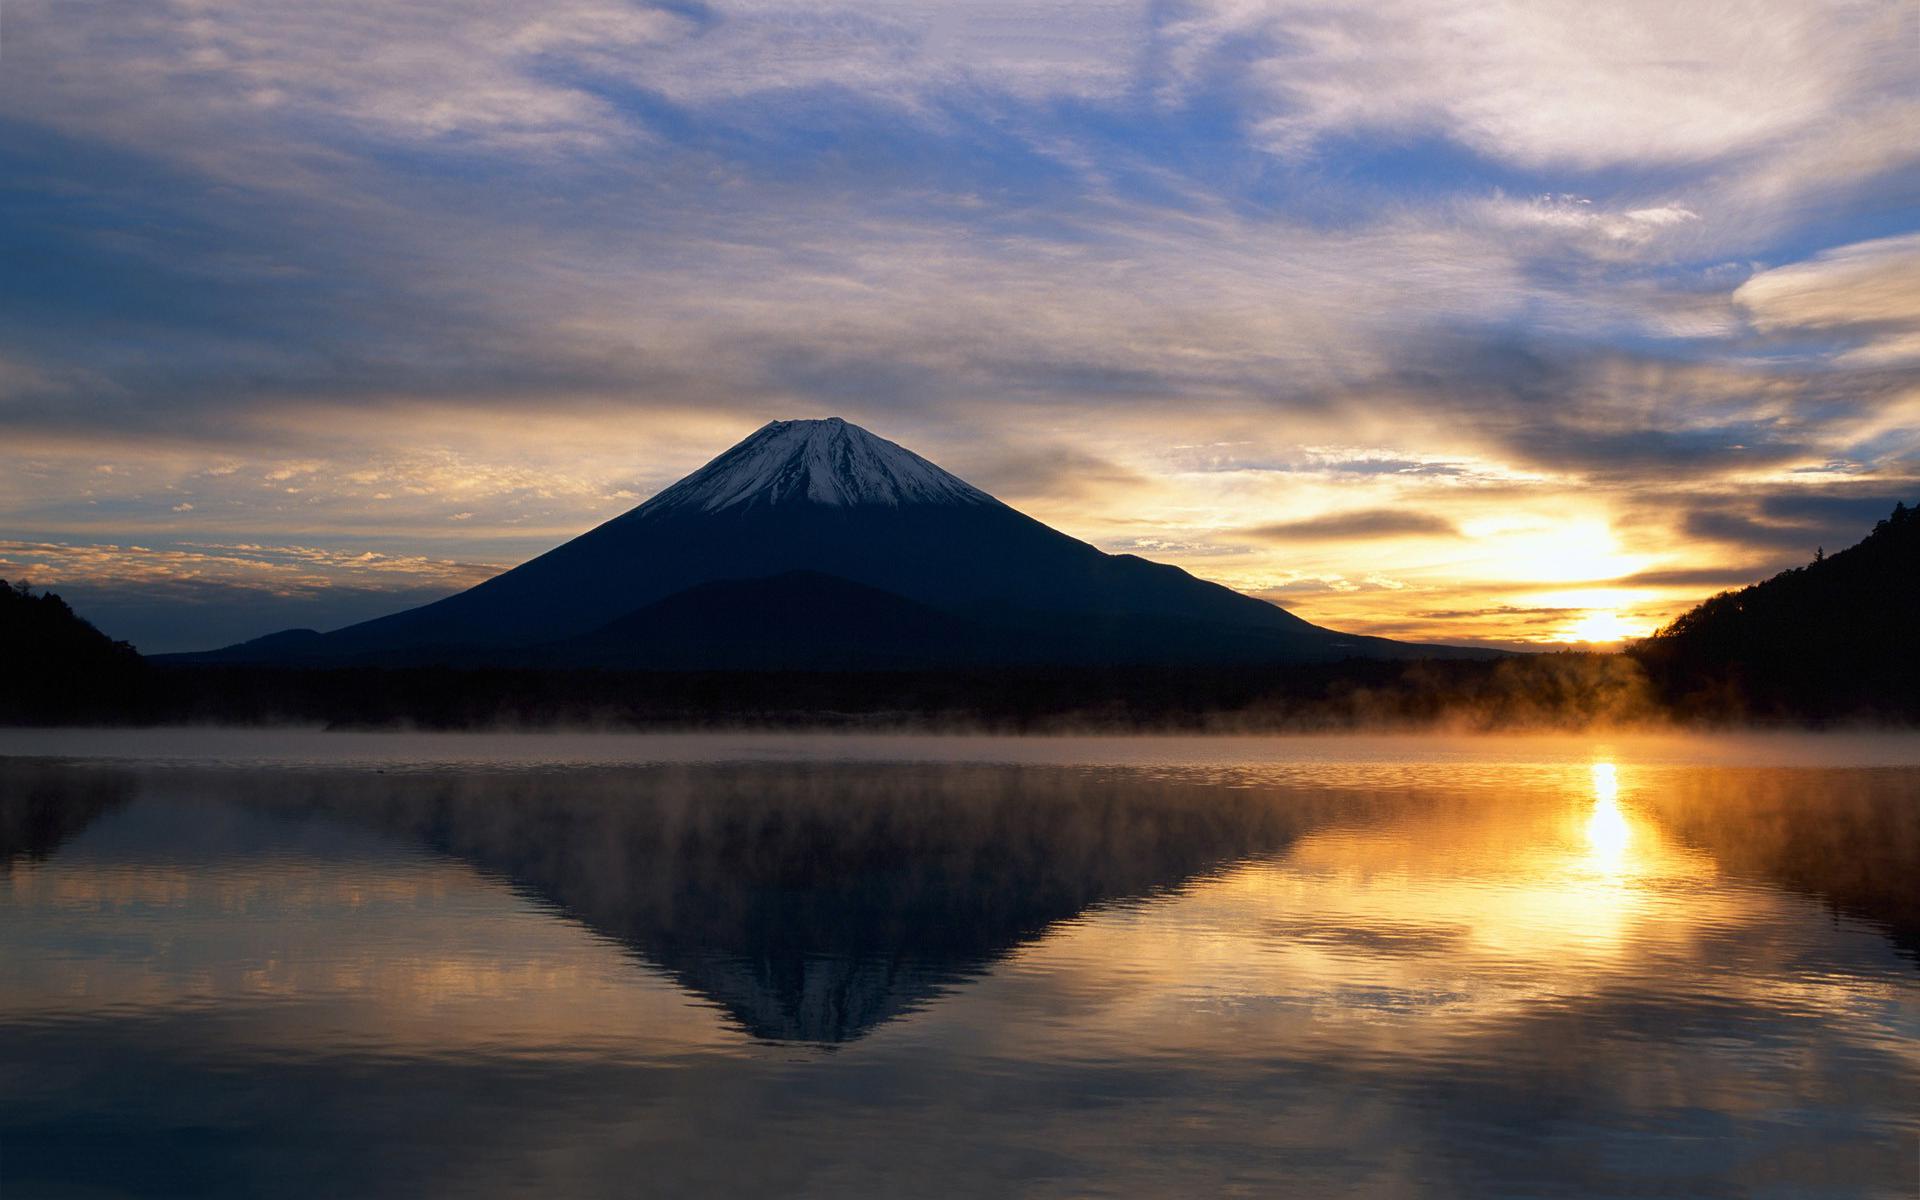 Buddha 3d Wallpaper Hd 15 Hd Mount Fuji Japan Wallpapers Hdwallsource Com